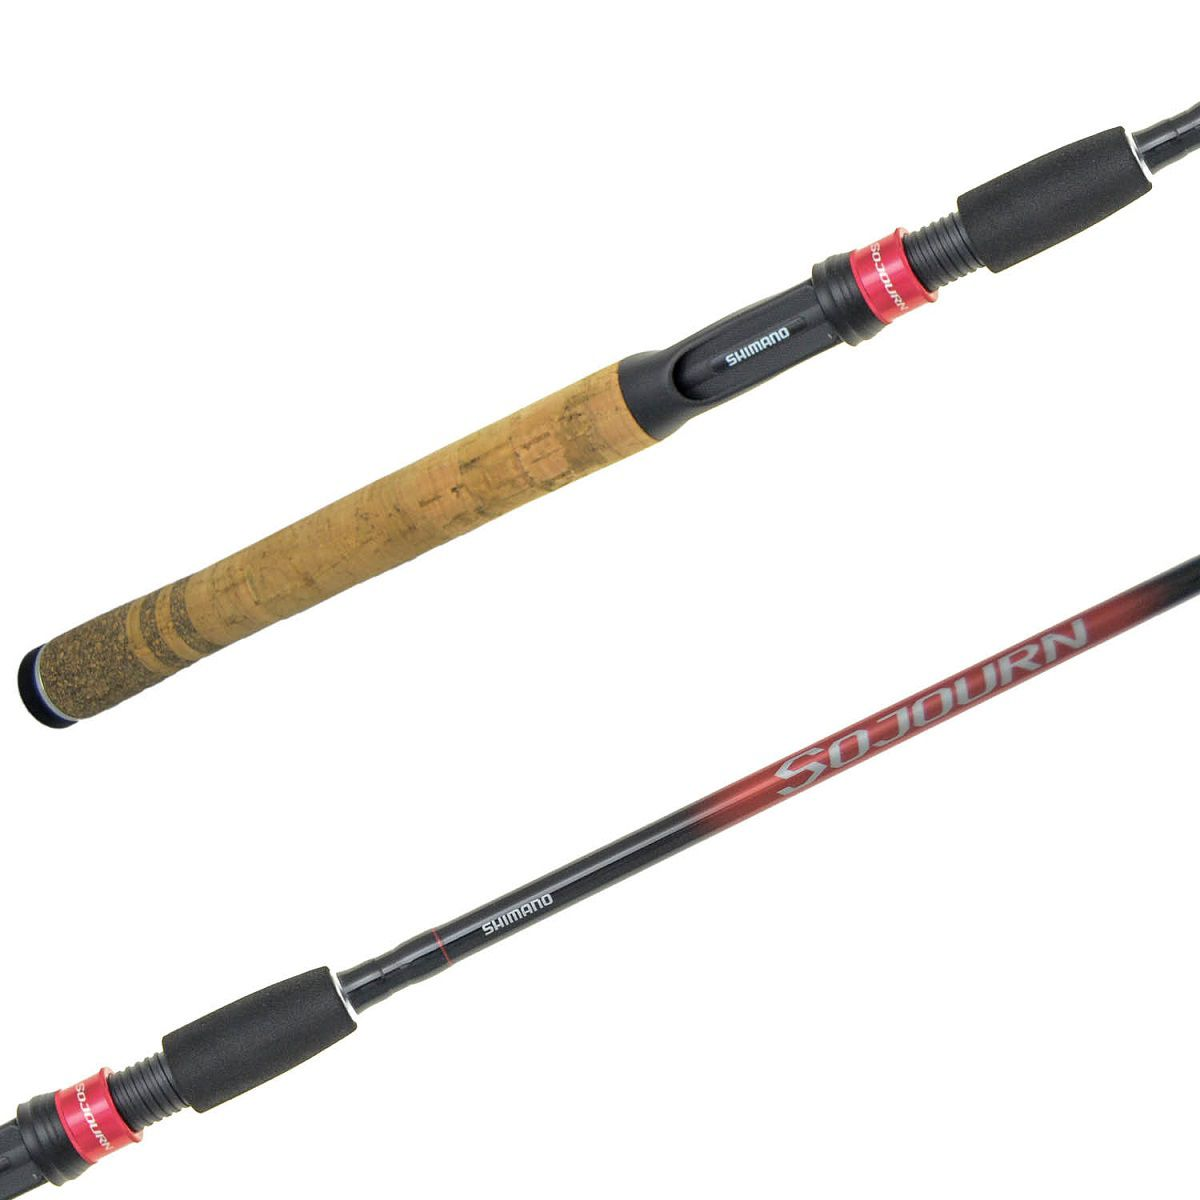 Vara Pesca Carretilha Shimano Sojourn SJC66M2B 1,98m 10-20 Lbs 2 Partes